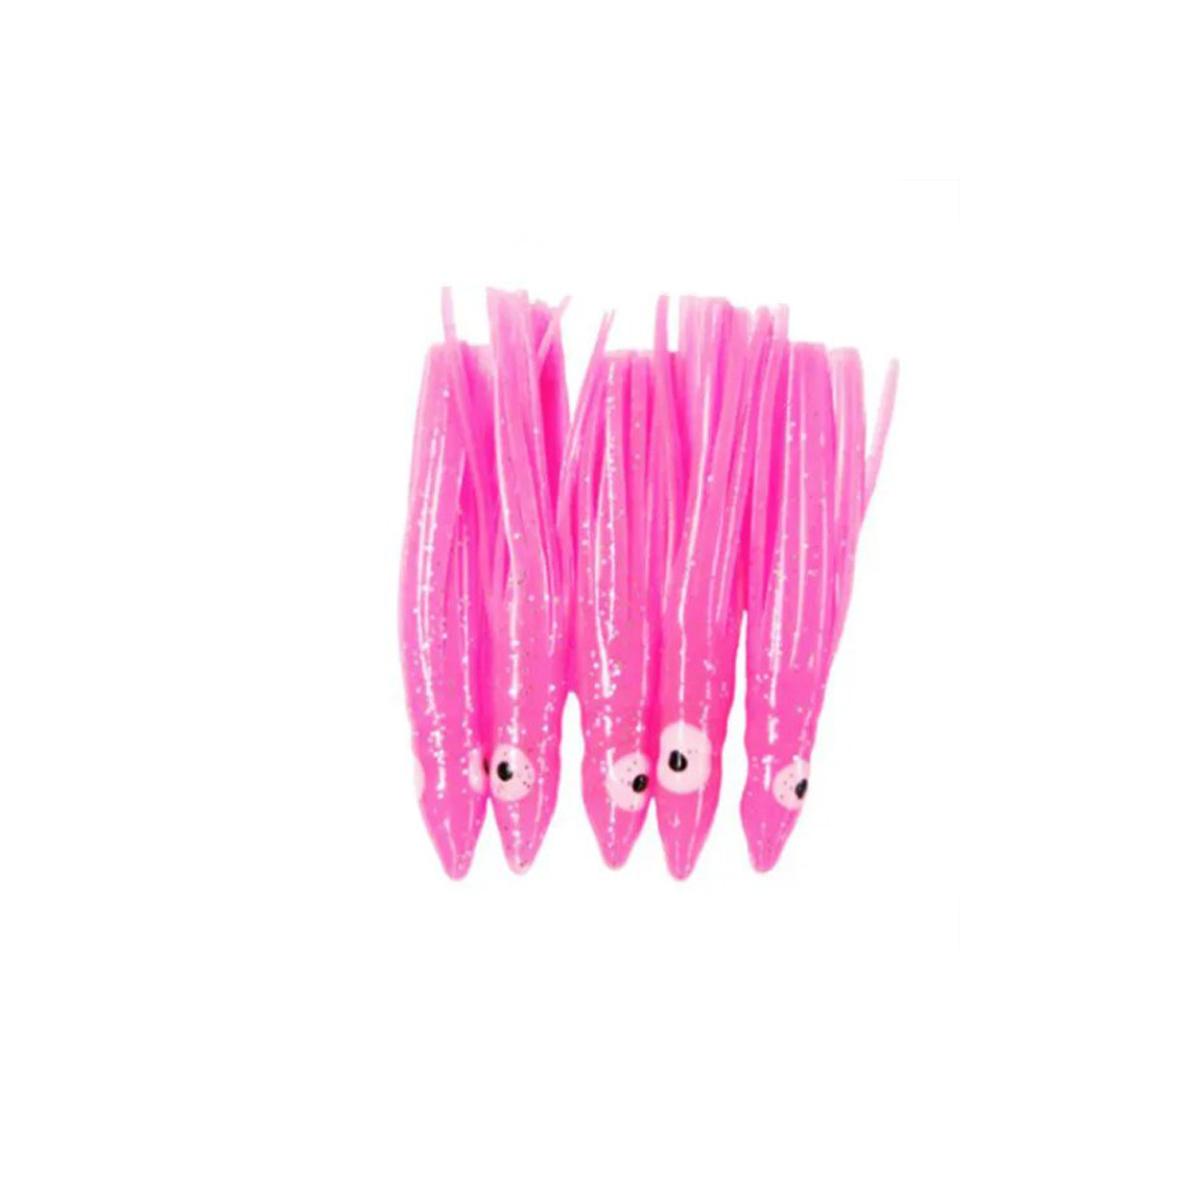 Kit 15 Lulinhas Kalmar 9 cm (Rosa)  - Pró Pesca Shop